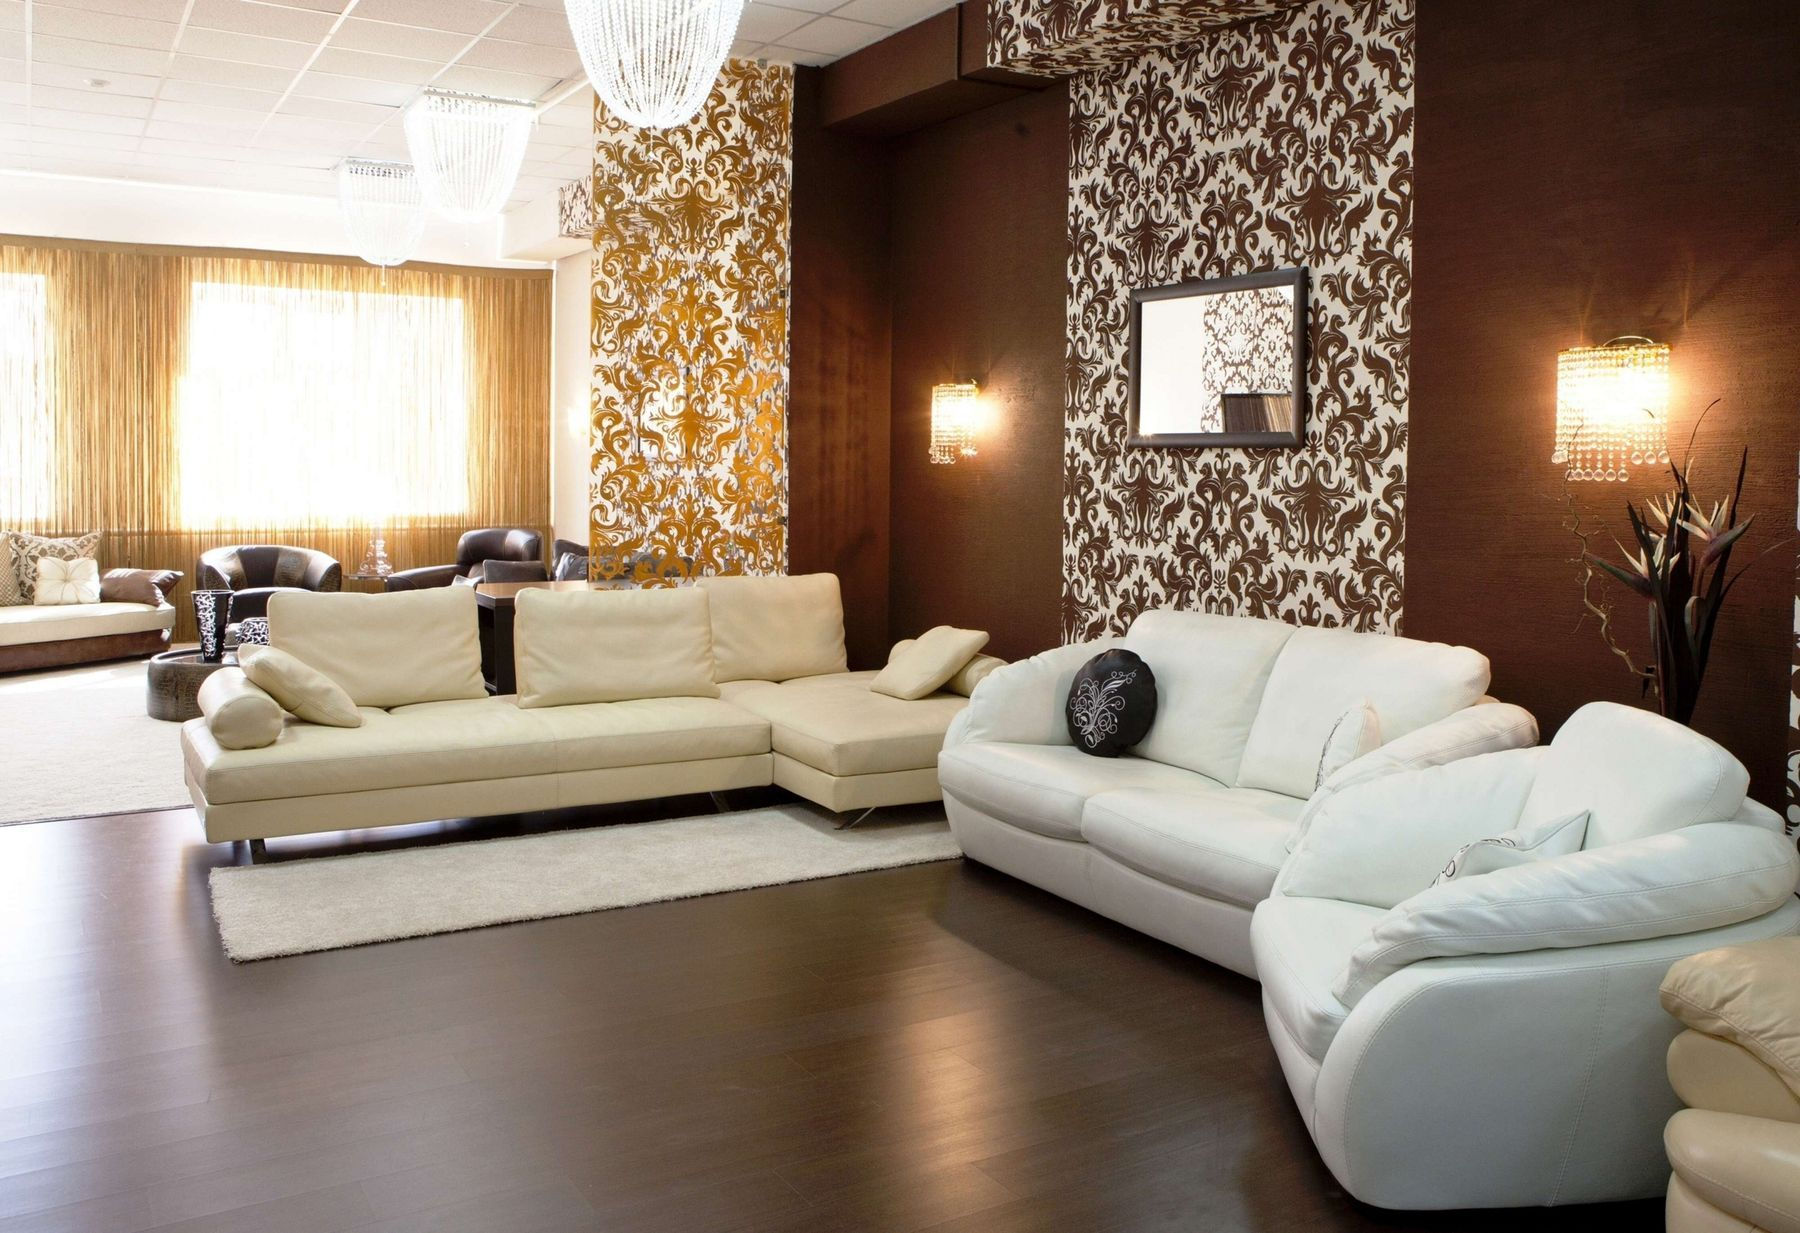 Best 15 Beautiful Living Room Wall Wallpaper Design Ideas For 400 x 300